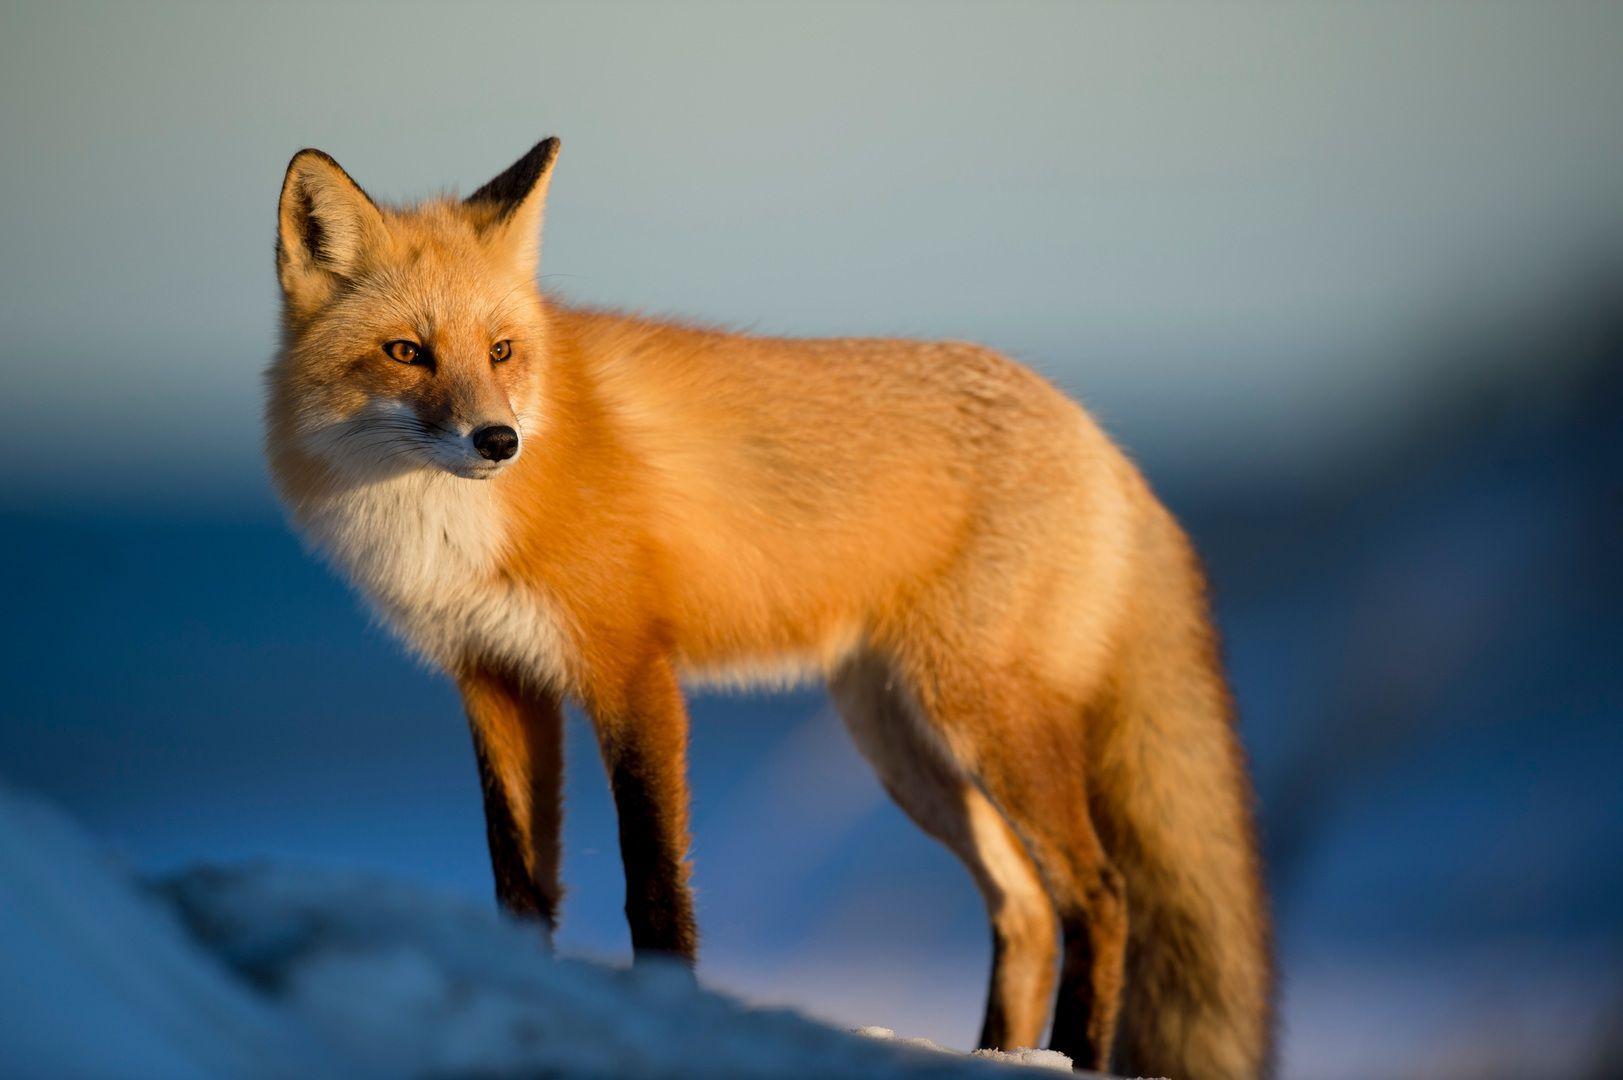 Red fox standing in sunlight